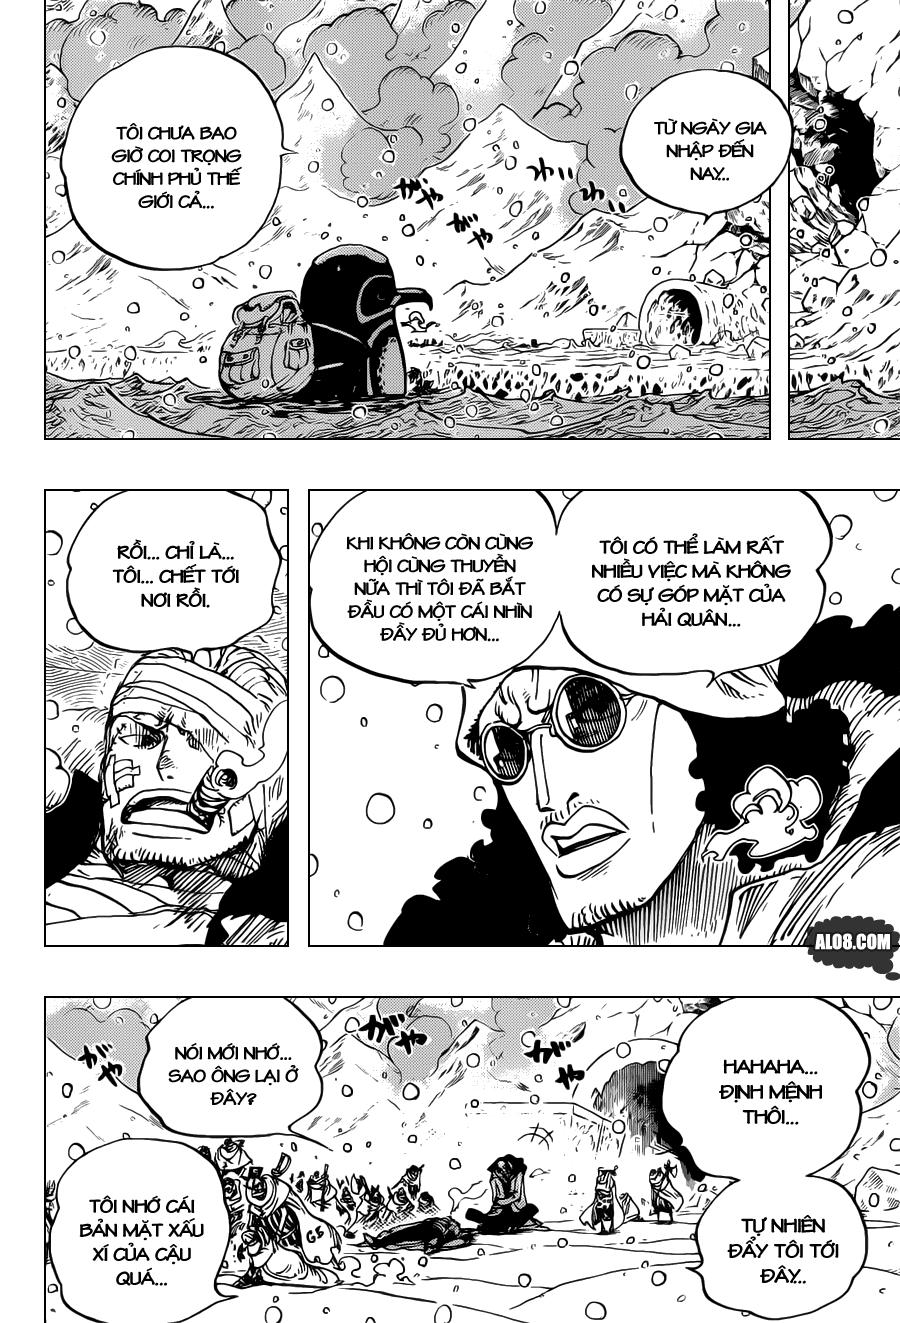 One Piece Chapter 699: Báo sáng 008